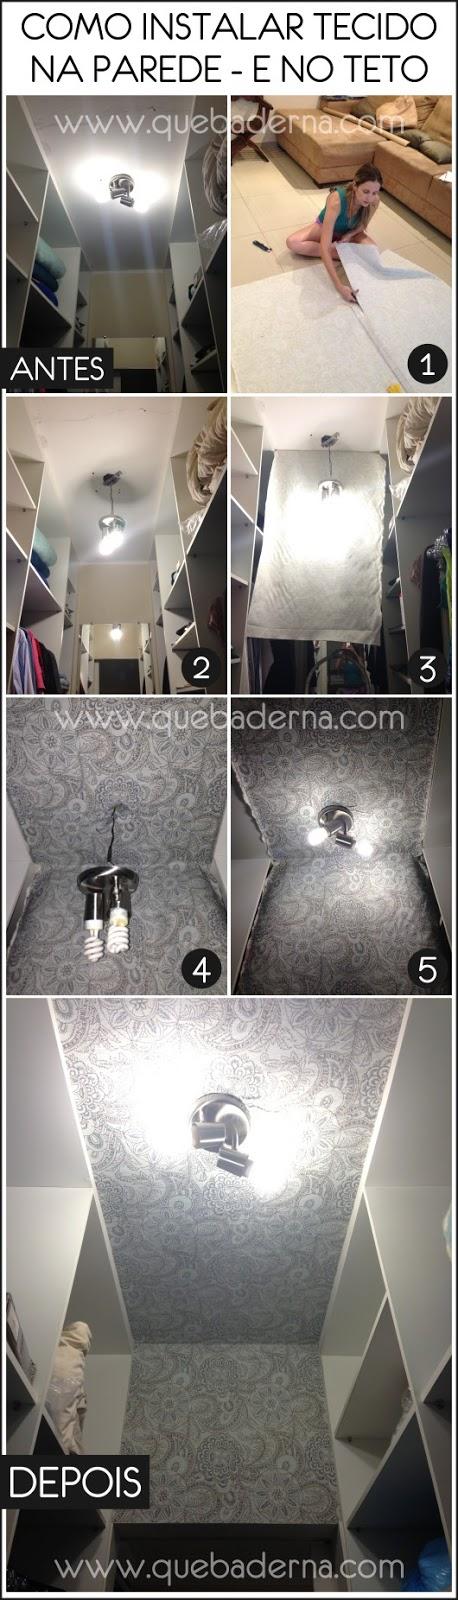 Como instalar tecido no teto e na parede